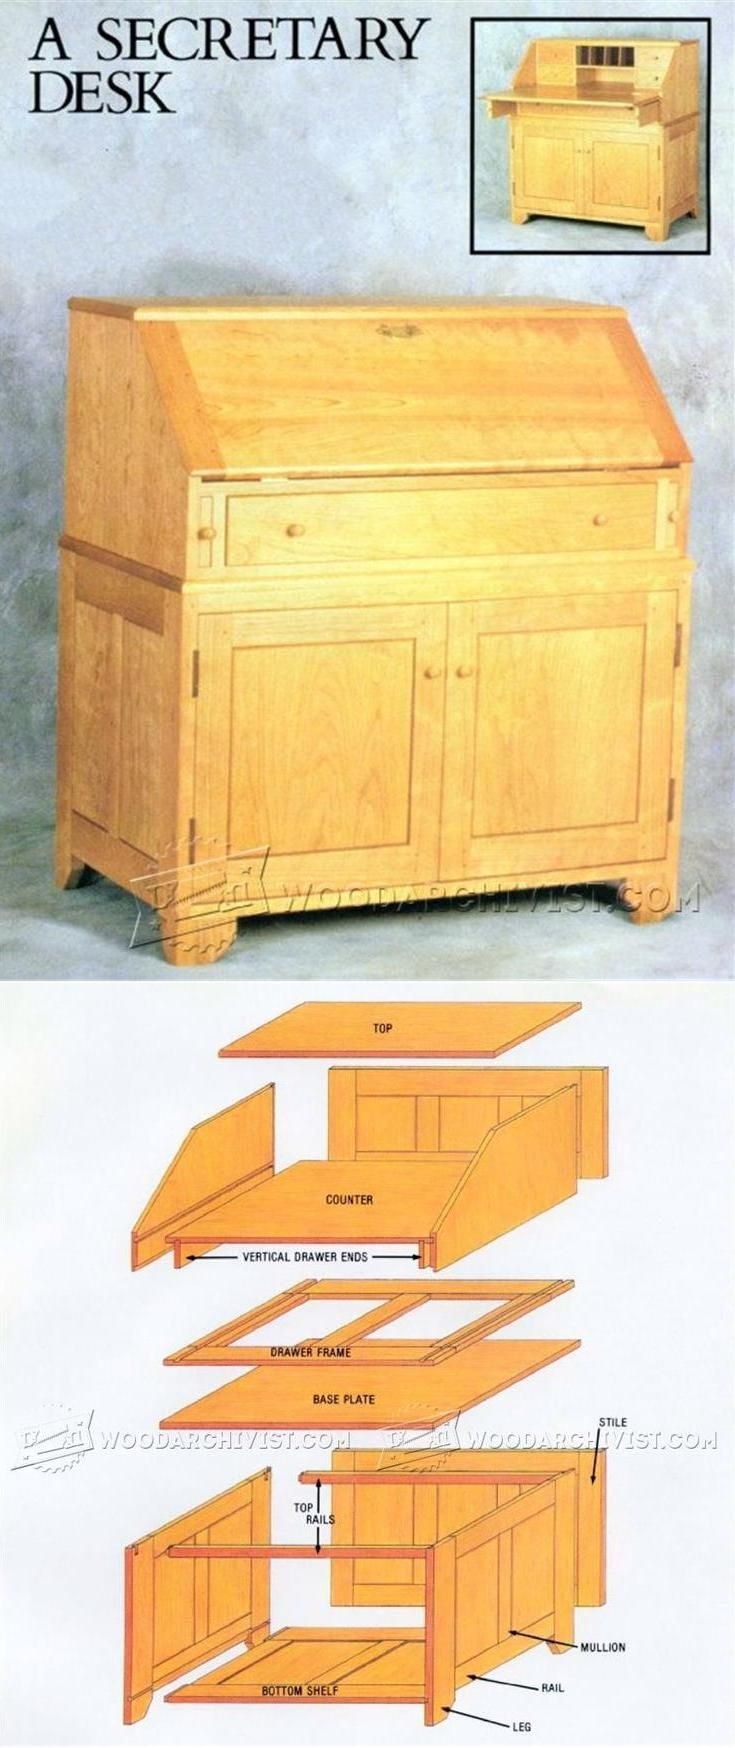 DIY Secretary Desk - Furniture Plans and Projects | WoodArchivist.com